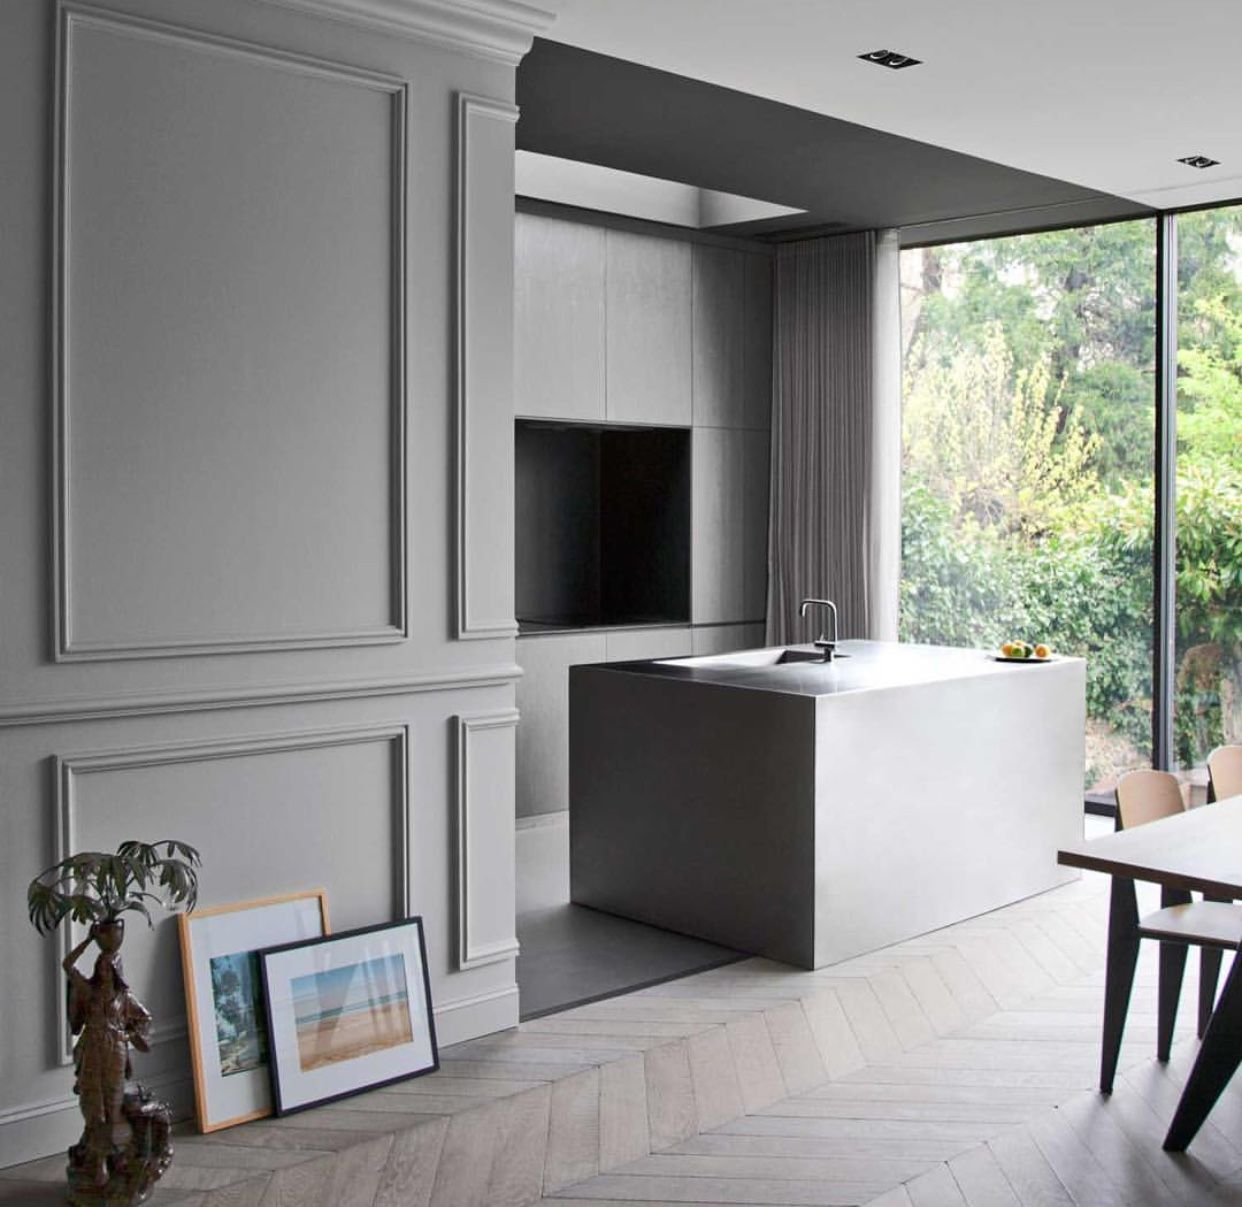 pinterest margarethagrace Rumah, Desain, Arsitektur